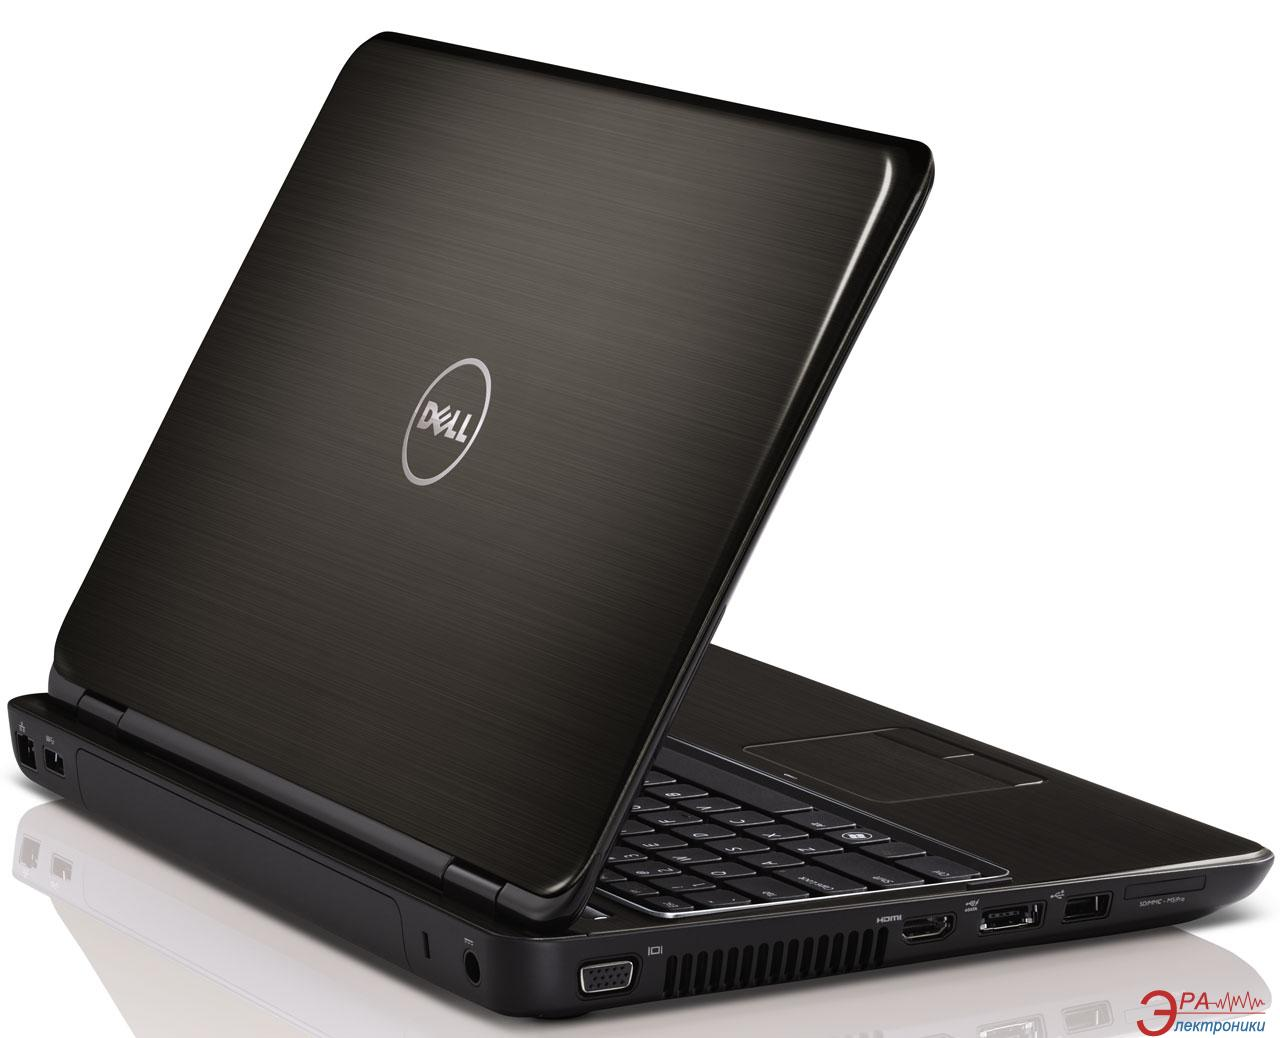 Ноутбук Dell Inspiron N7110 (N7110Gi2430D6C640BSCDSblack) Black 17,3